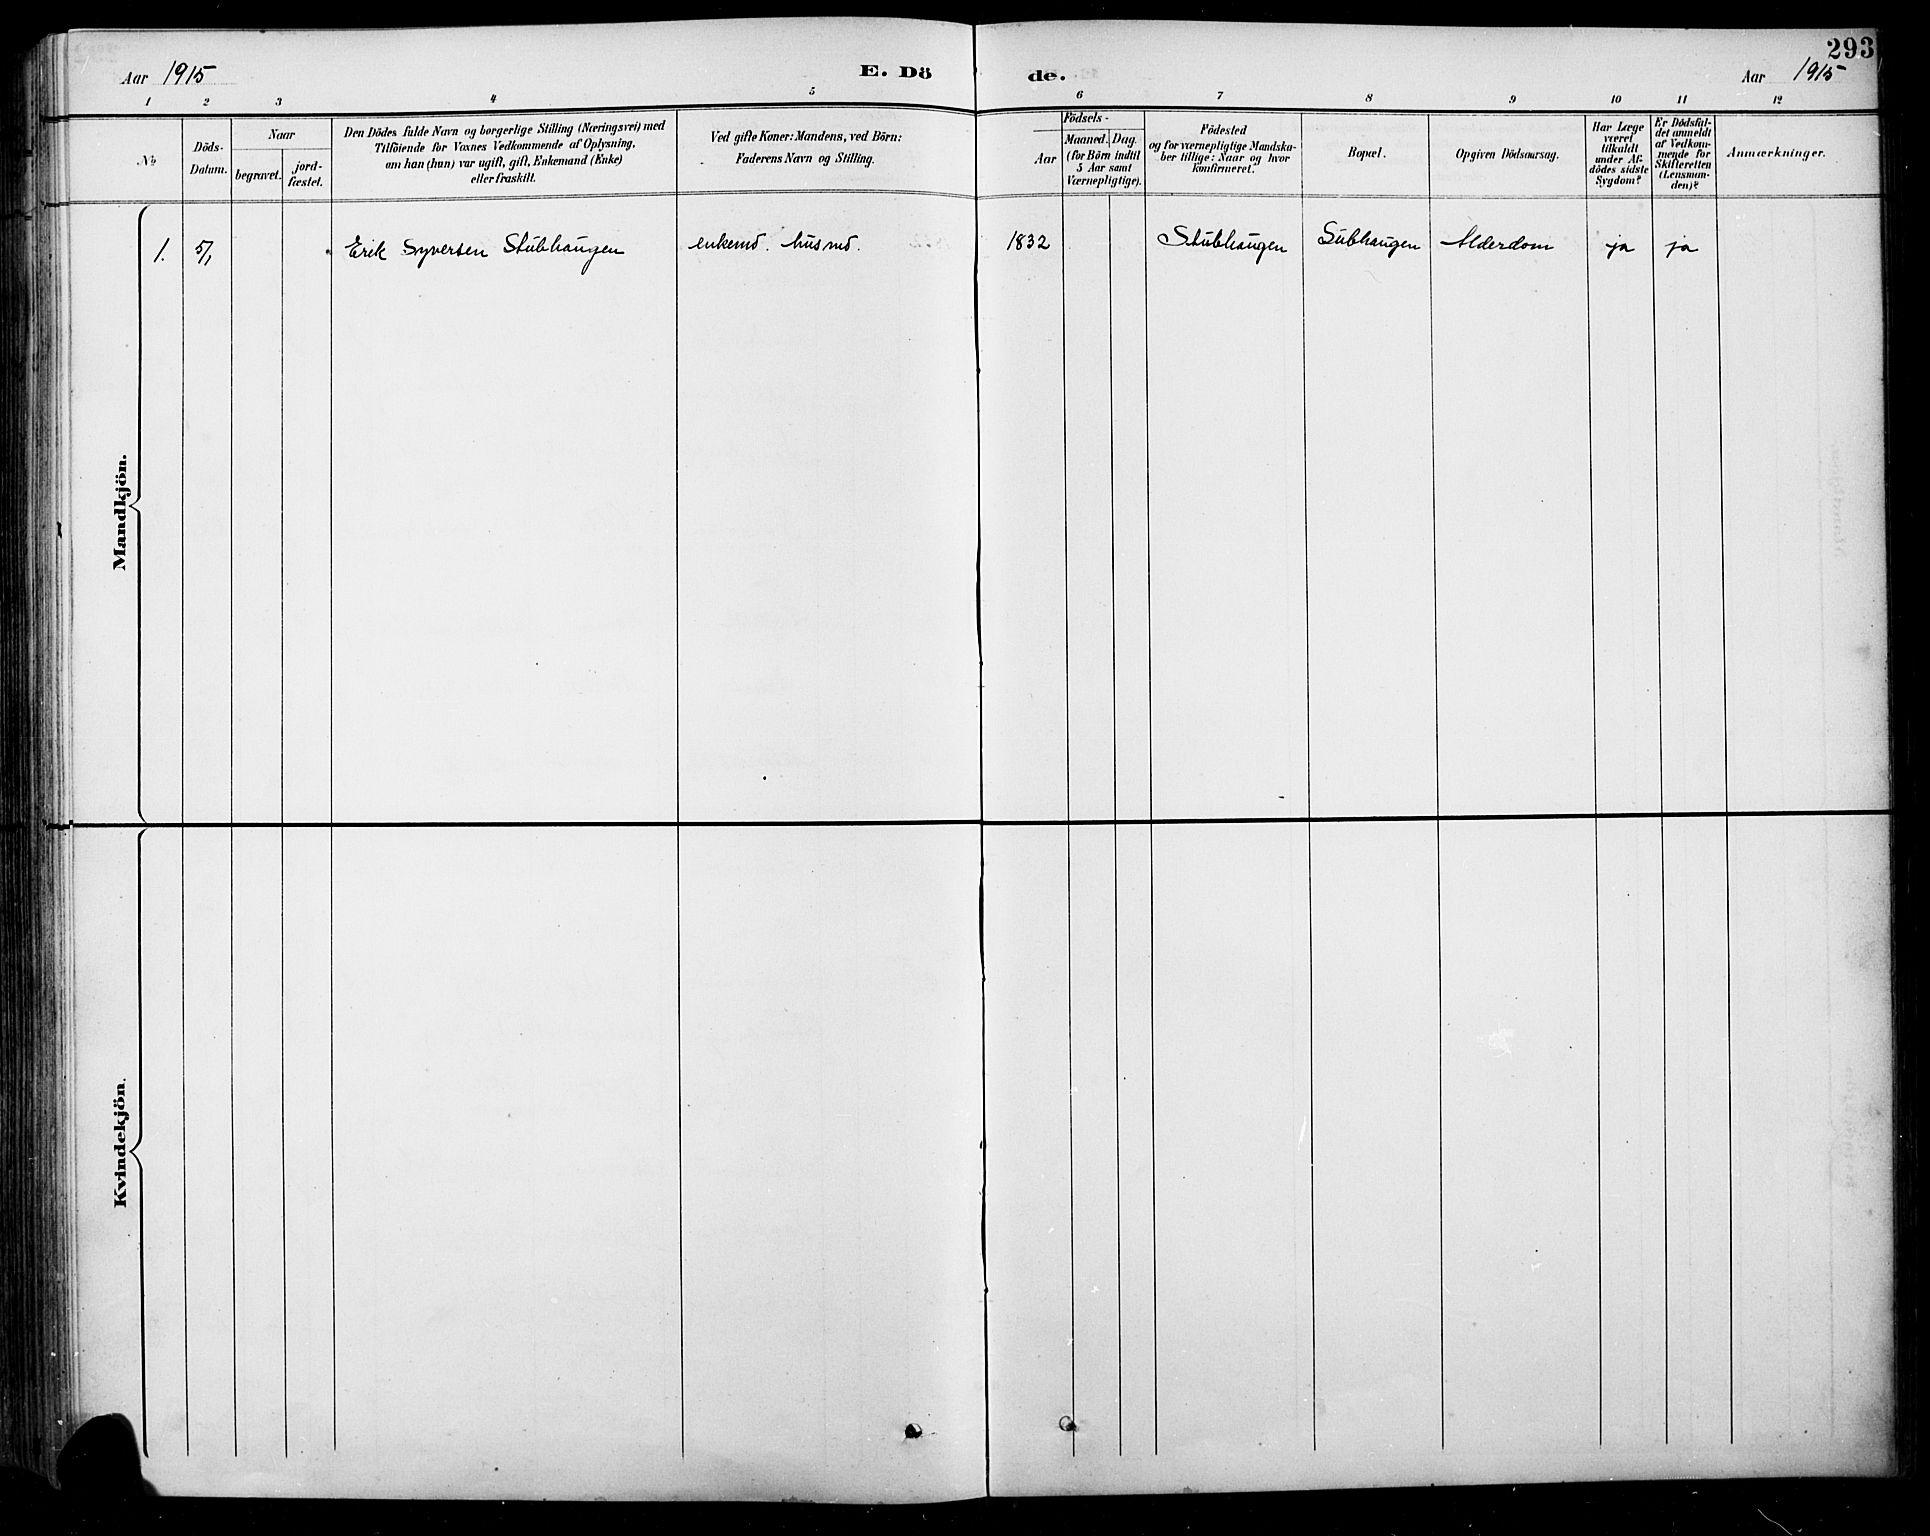 SAH, Sel prestekontor, Klokkerbok nr. 1, 1894-1923, s. 293